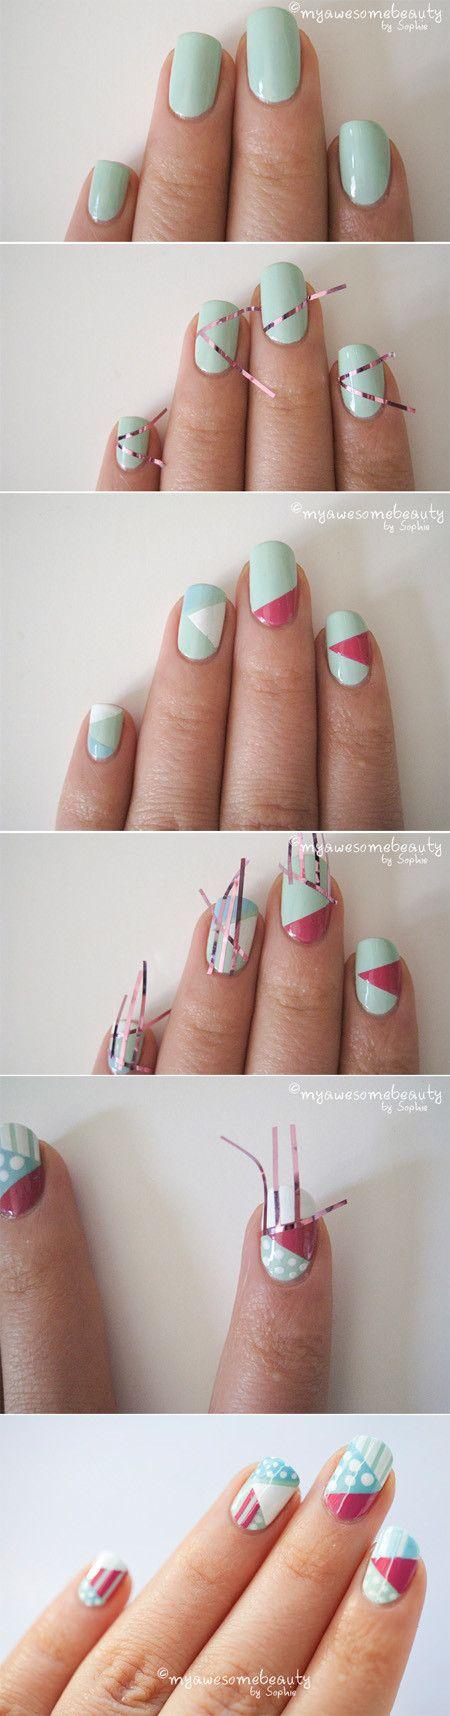 Nail art designs using tape